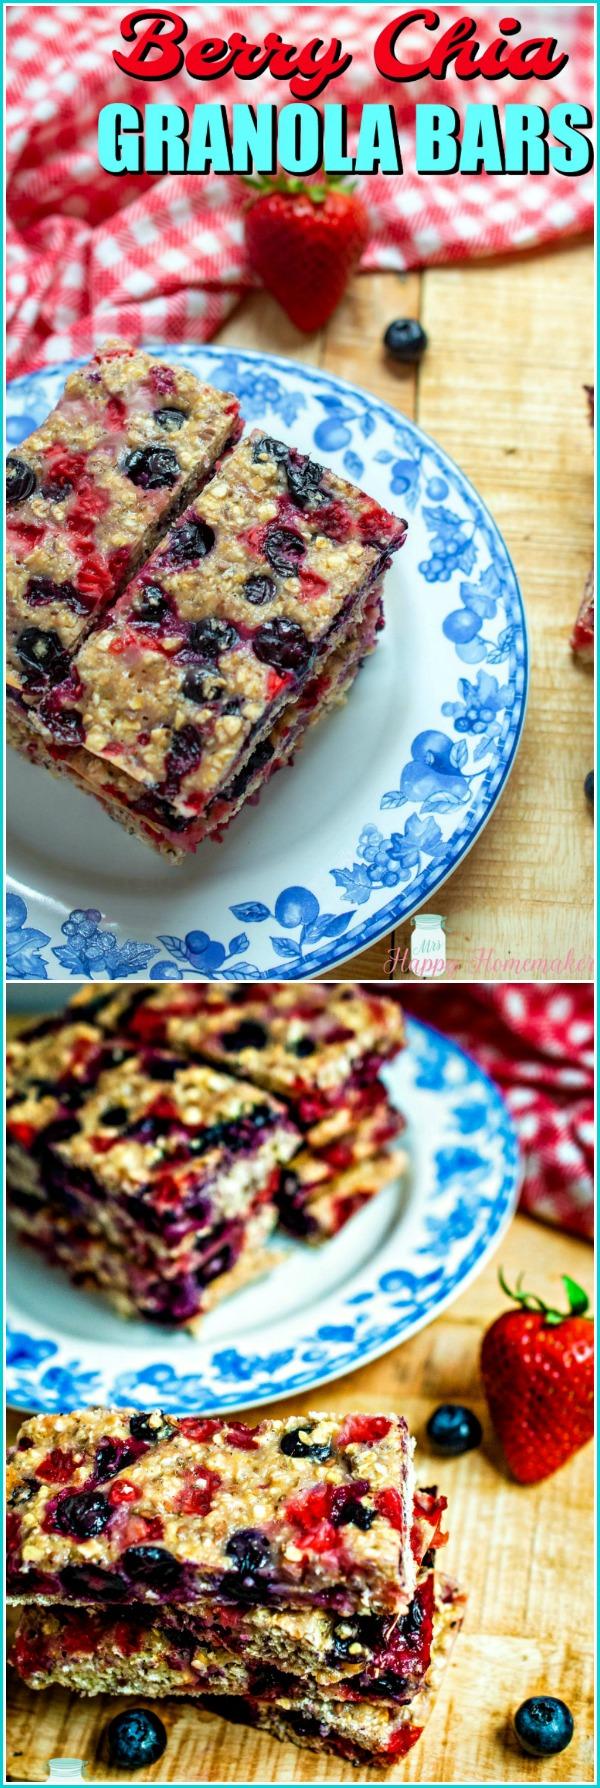 Berry Chia Seed Granola Bars